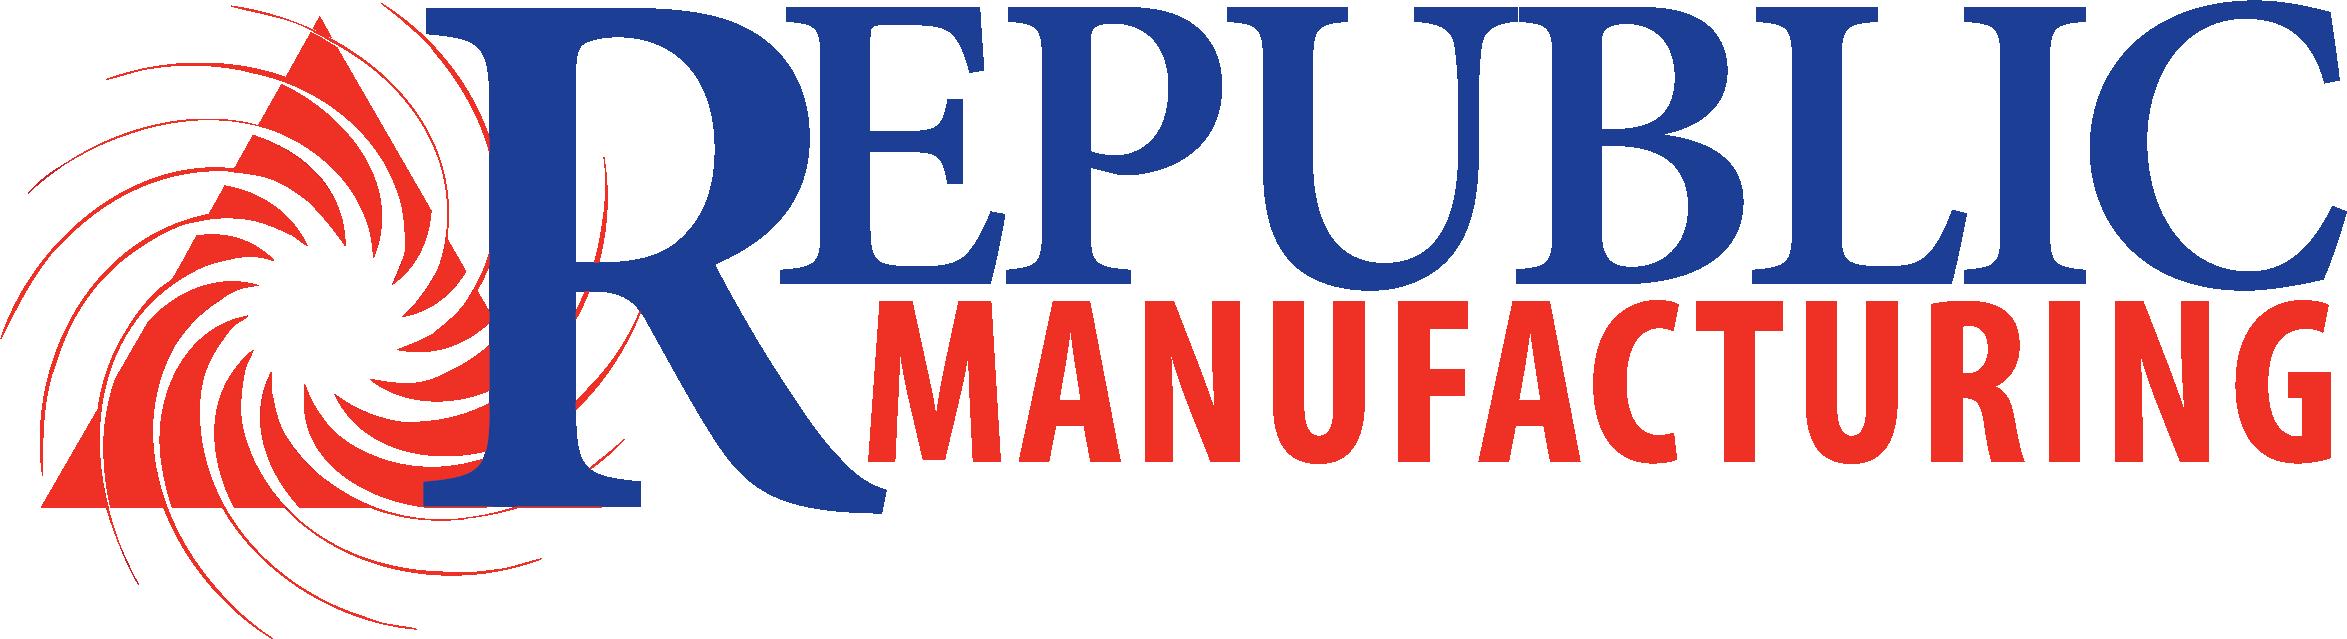 Republic Manufacturing logo